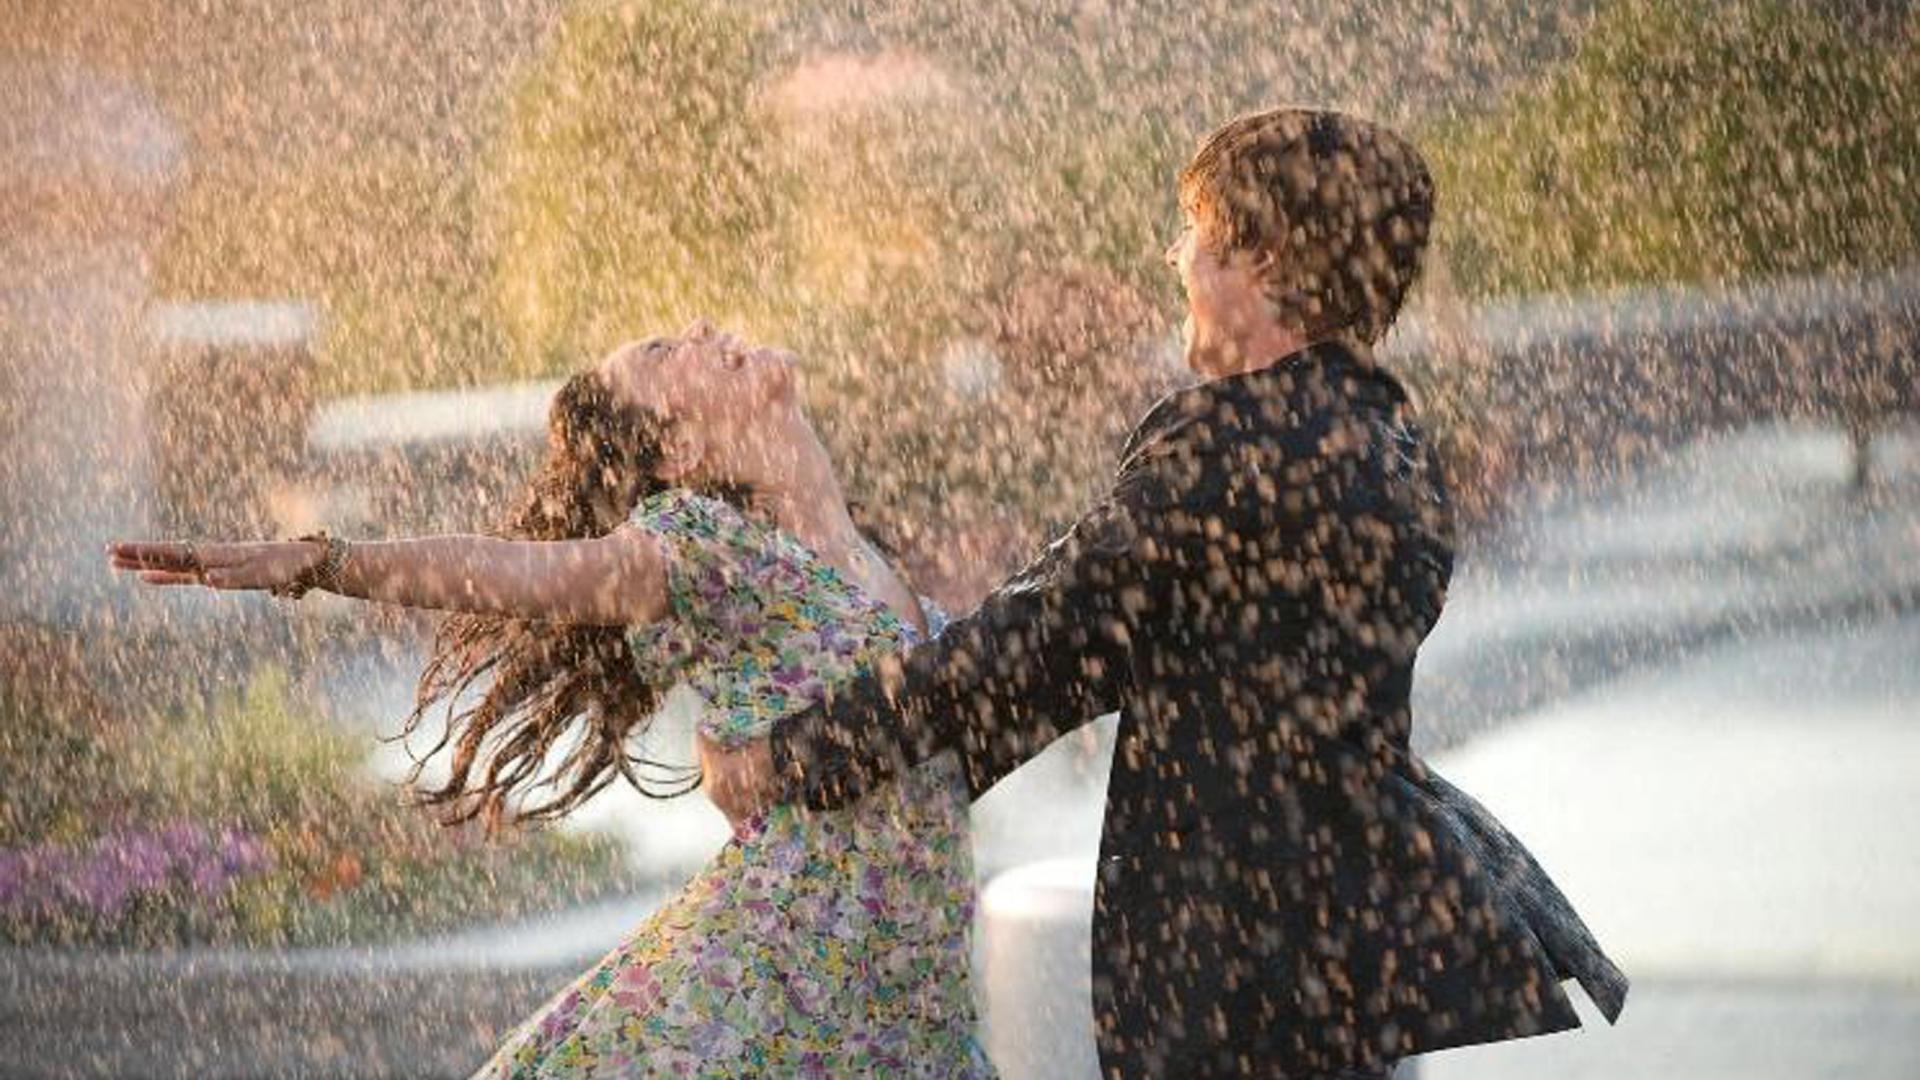 Couple Love Rain HD Wallpaper of Love   hdwallpaper2013com 1920x1080